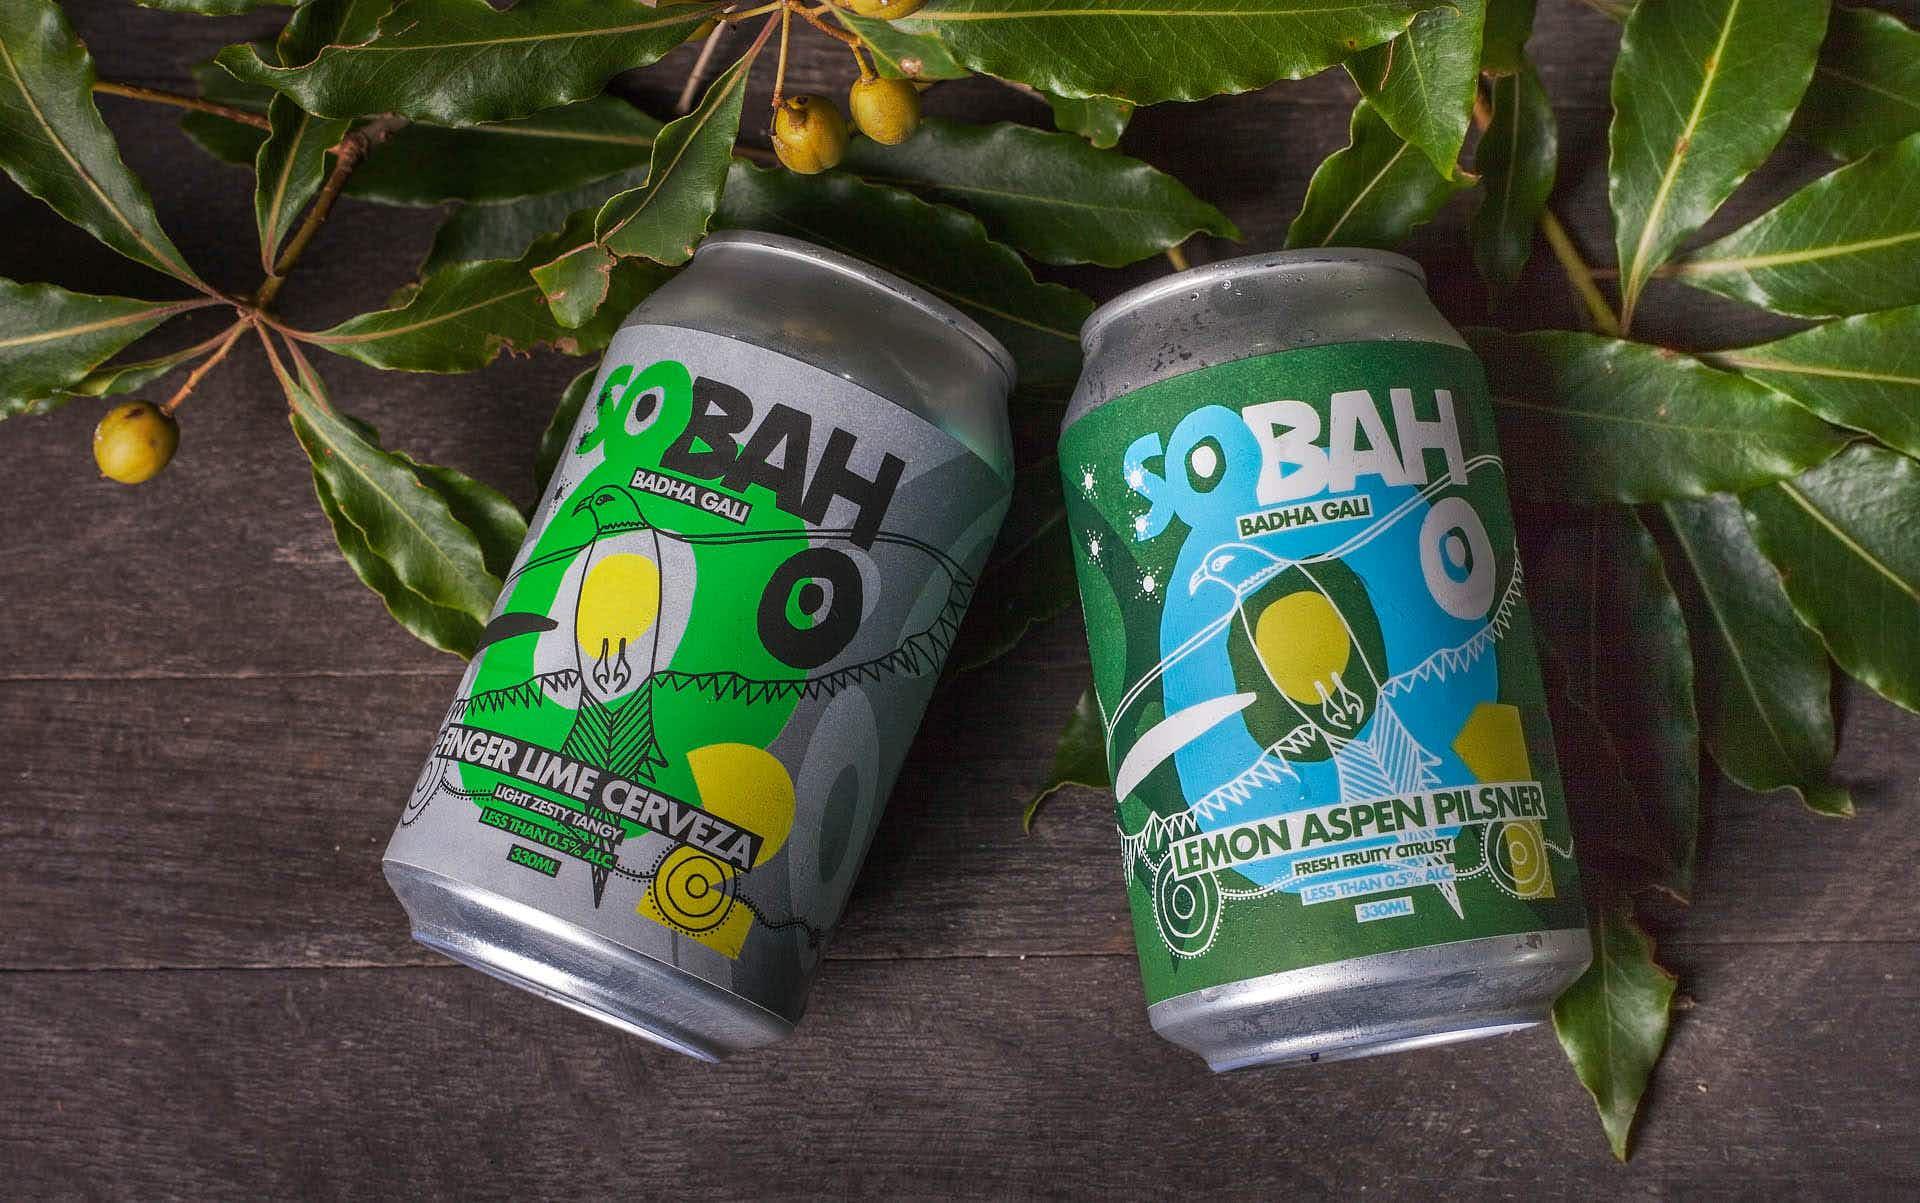 Aboriginal non-alcoholic craft beers enter the market in Australia